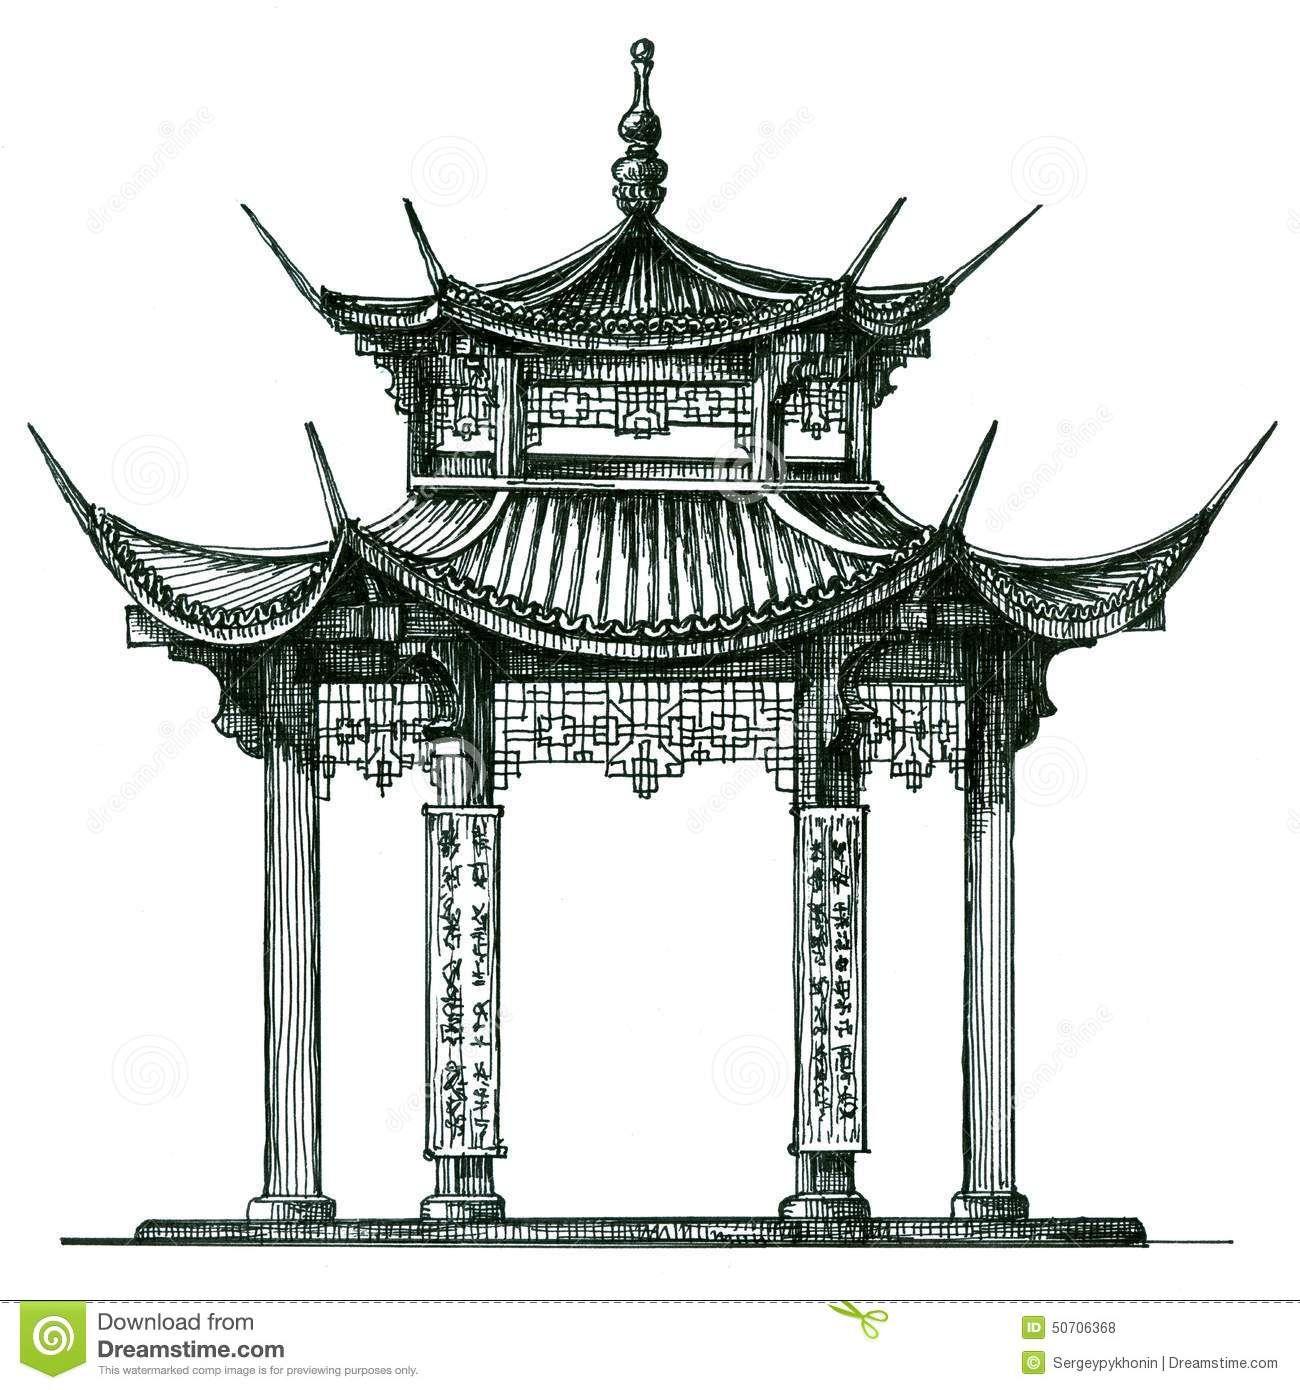 Pin By Yertay On Ninja Ancient Chinese Architecture Architecture Sketch Architecture Drawing